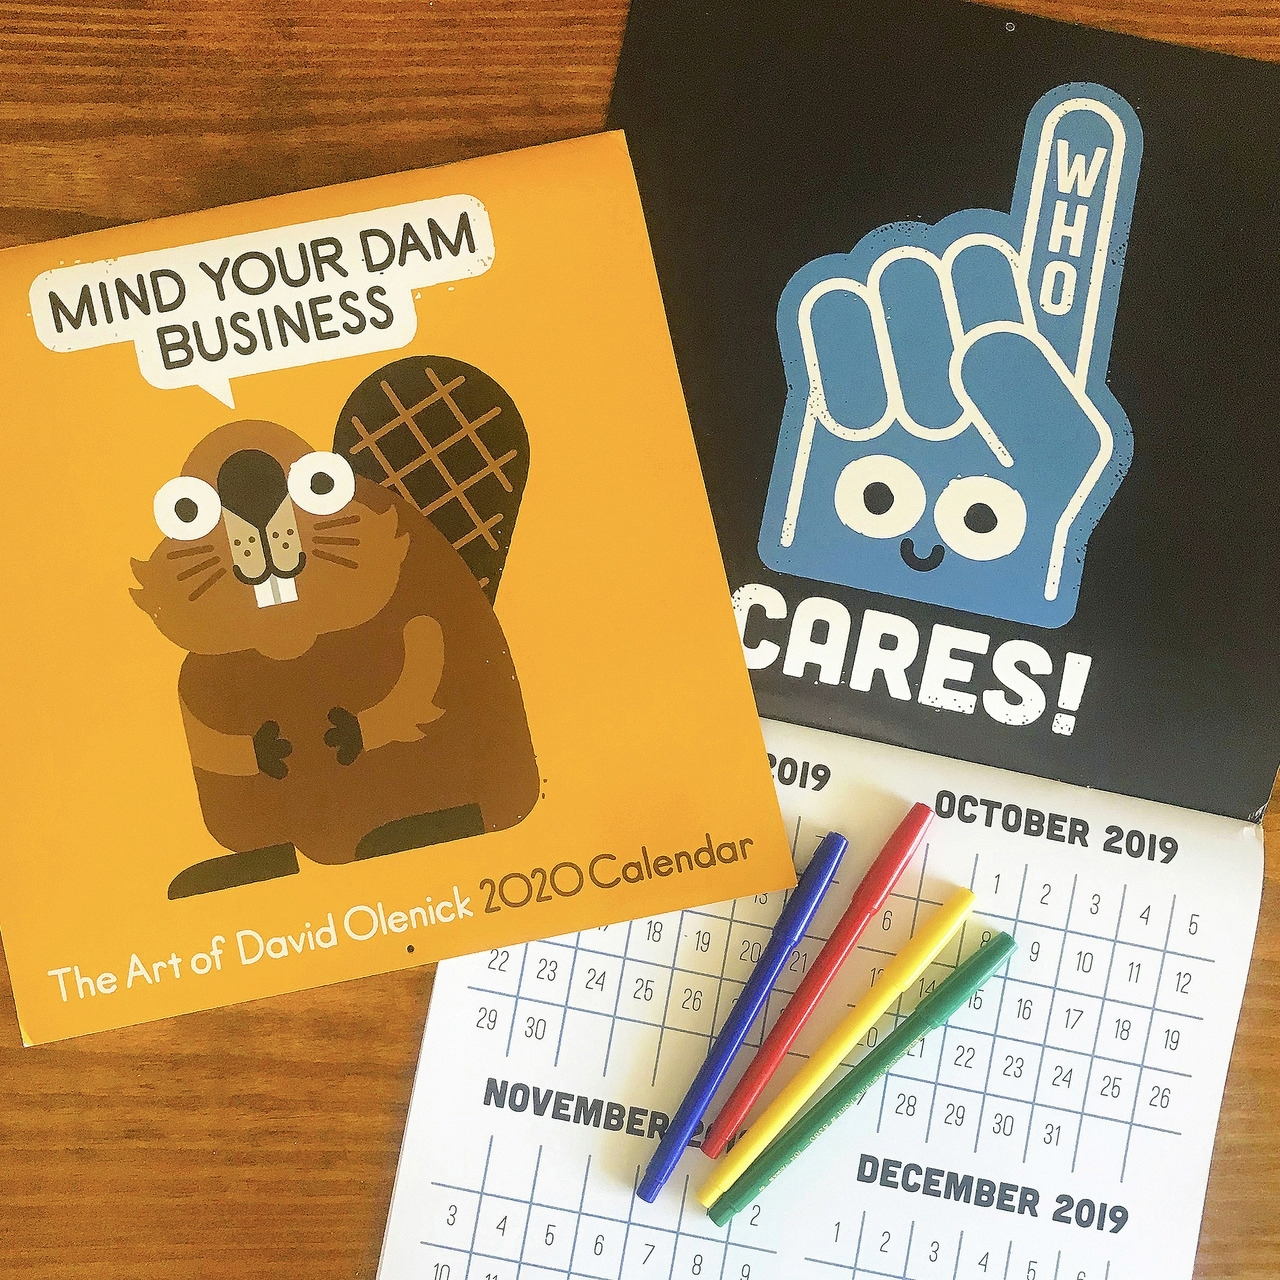 David Olenick — 2020 Calendar Available Now! The 1St Spread